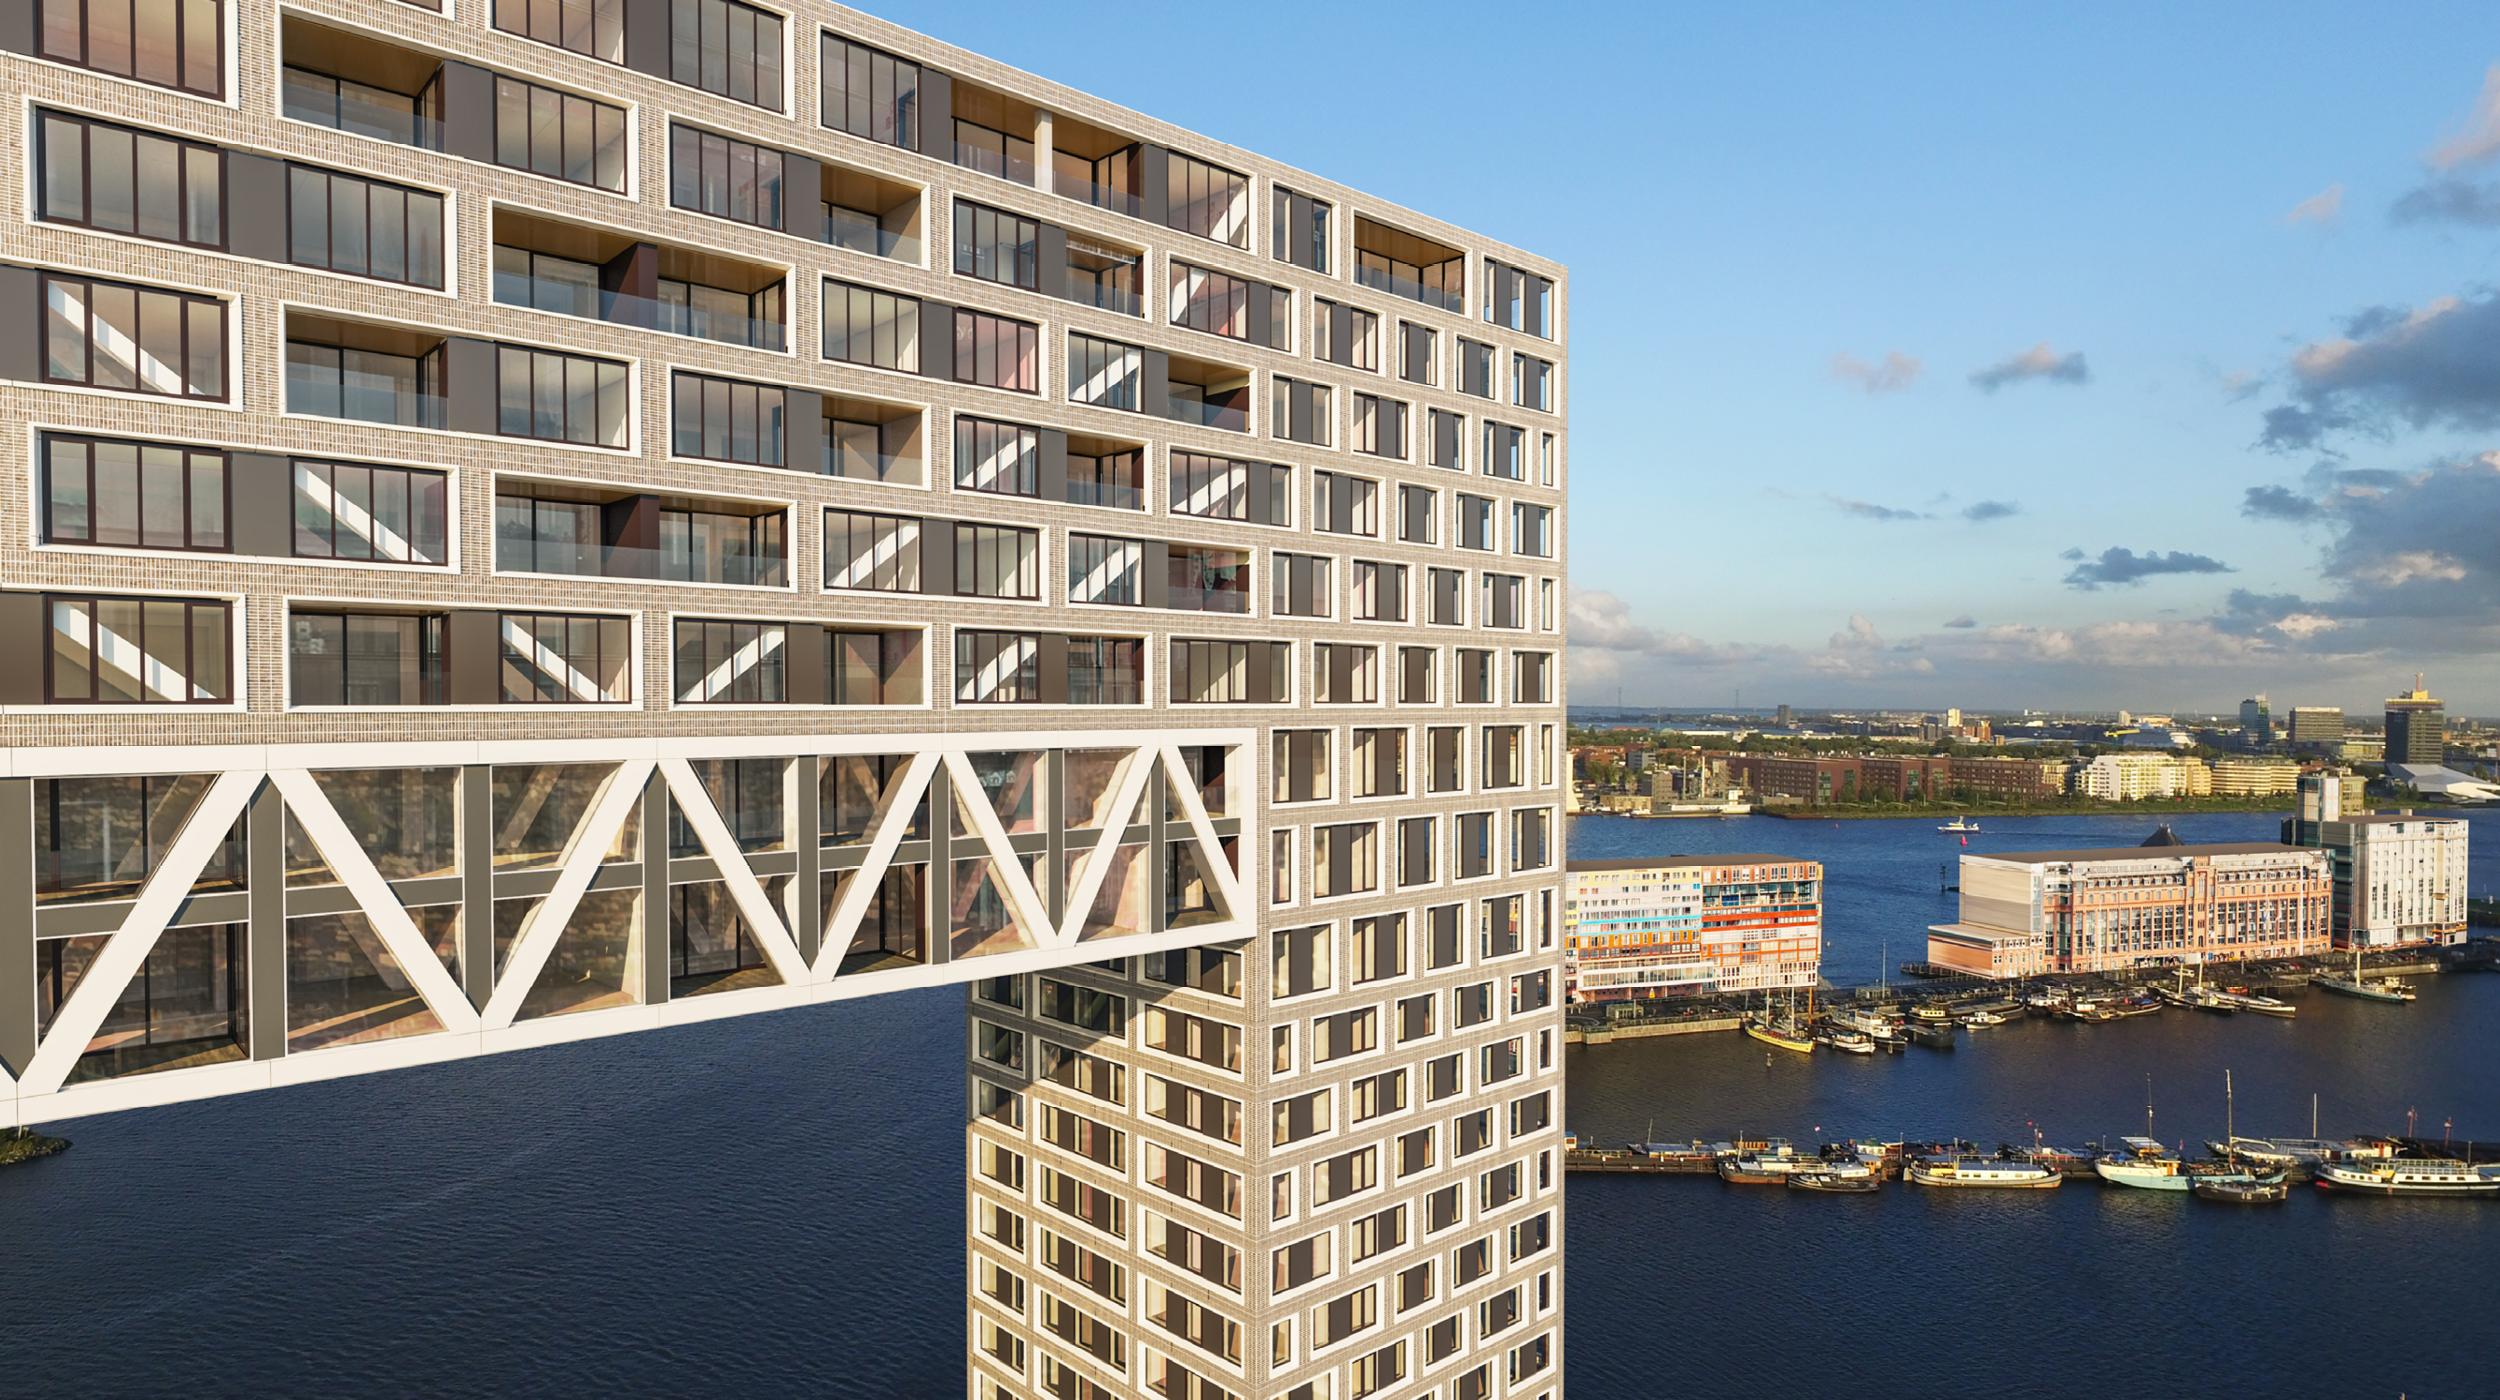 Pontsteiger houthavens Amsterdam verdieping